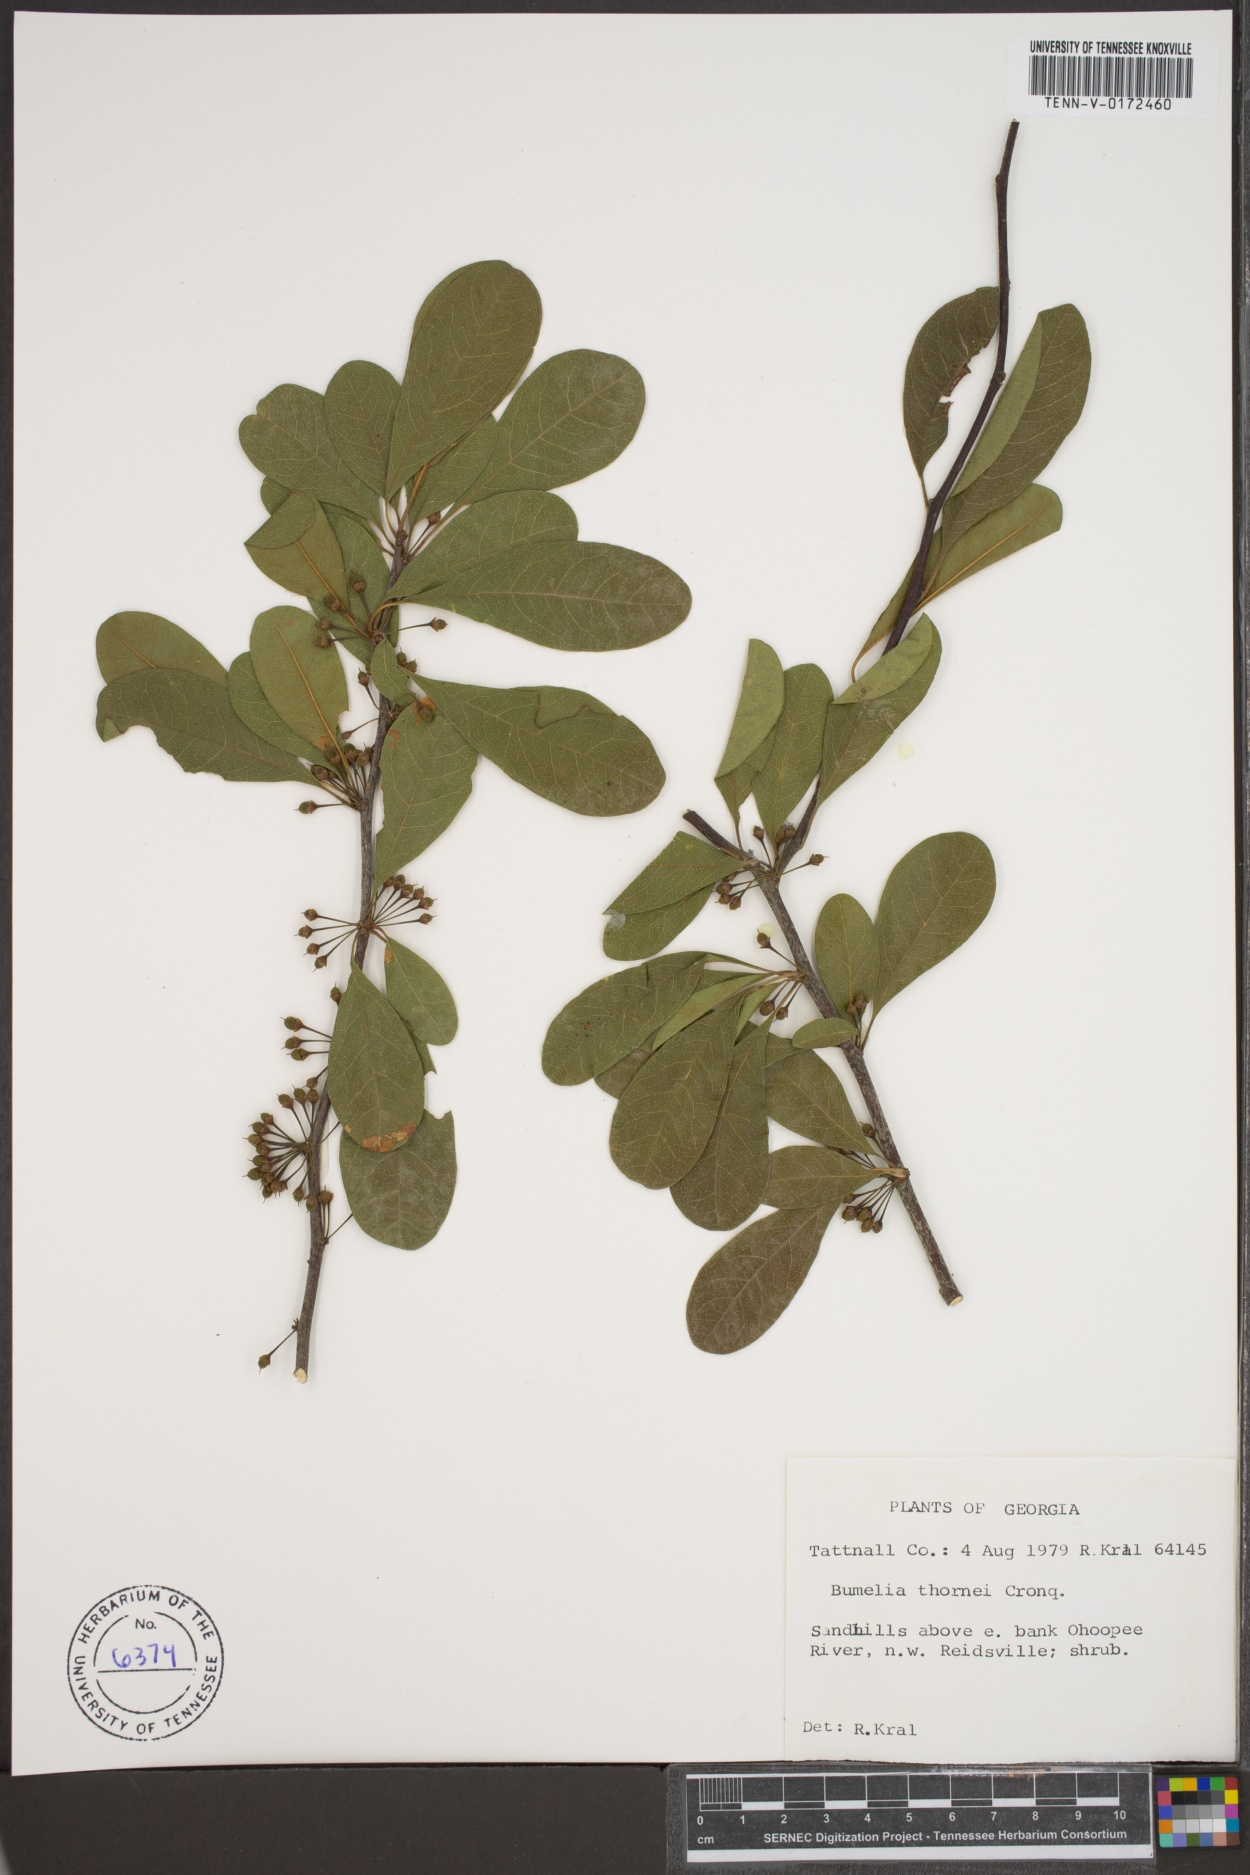 Bumelia thornei image